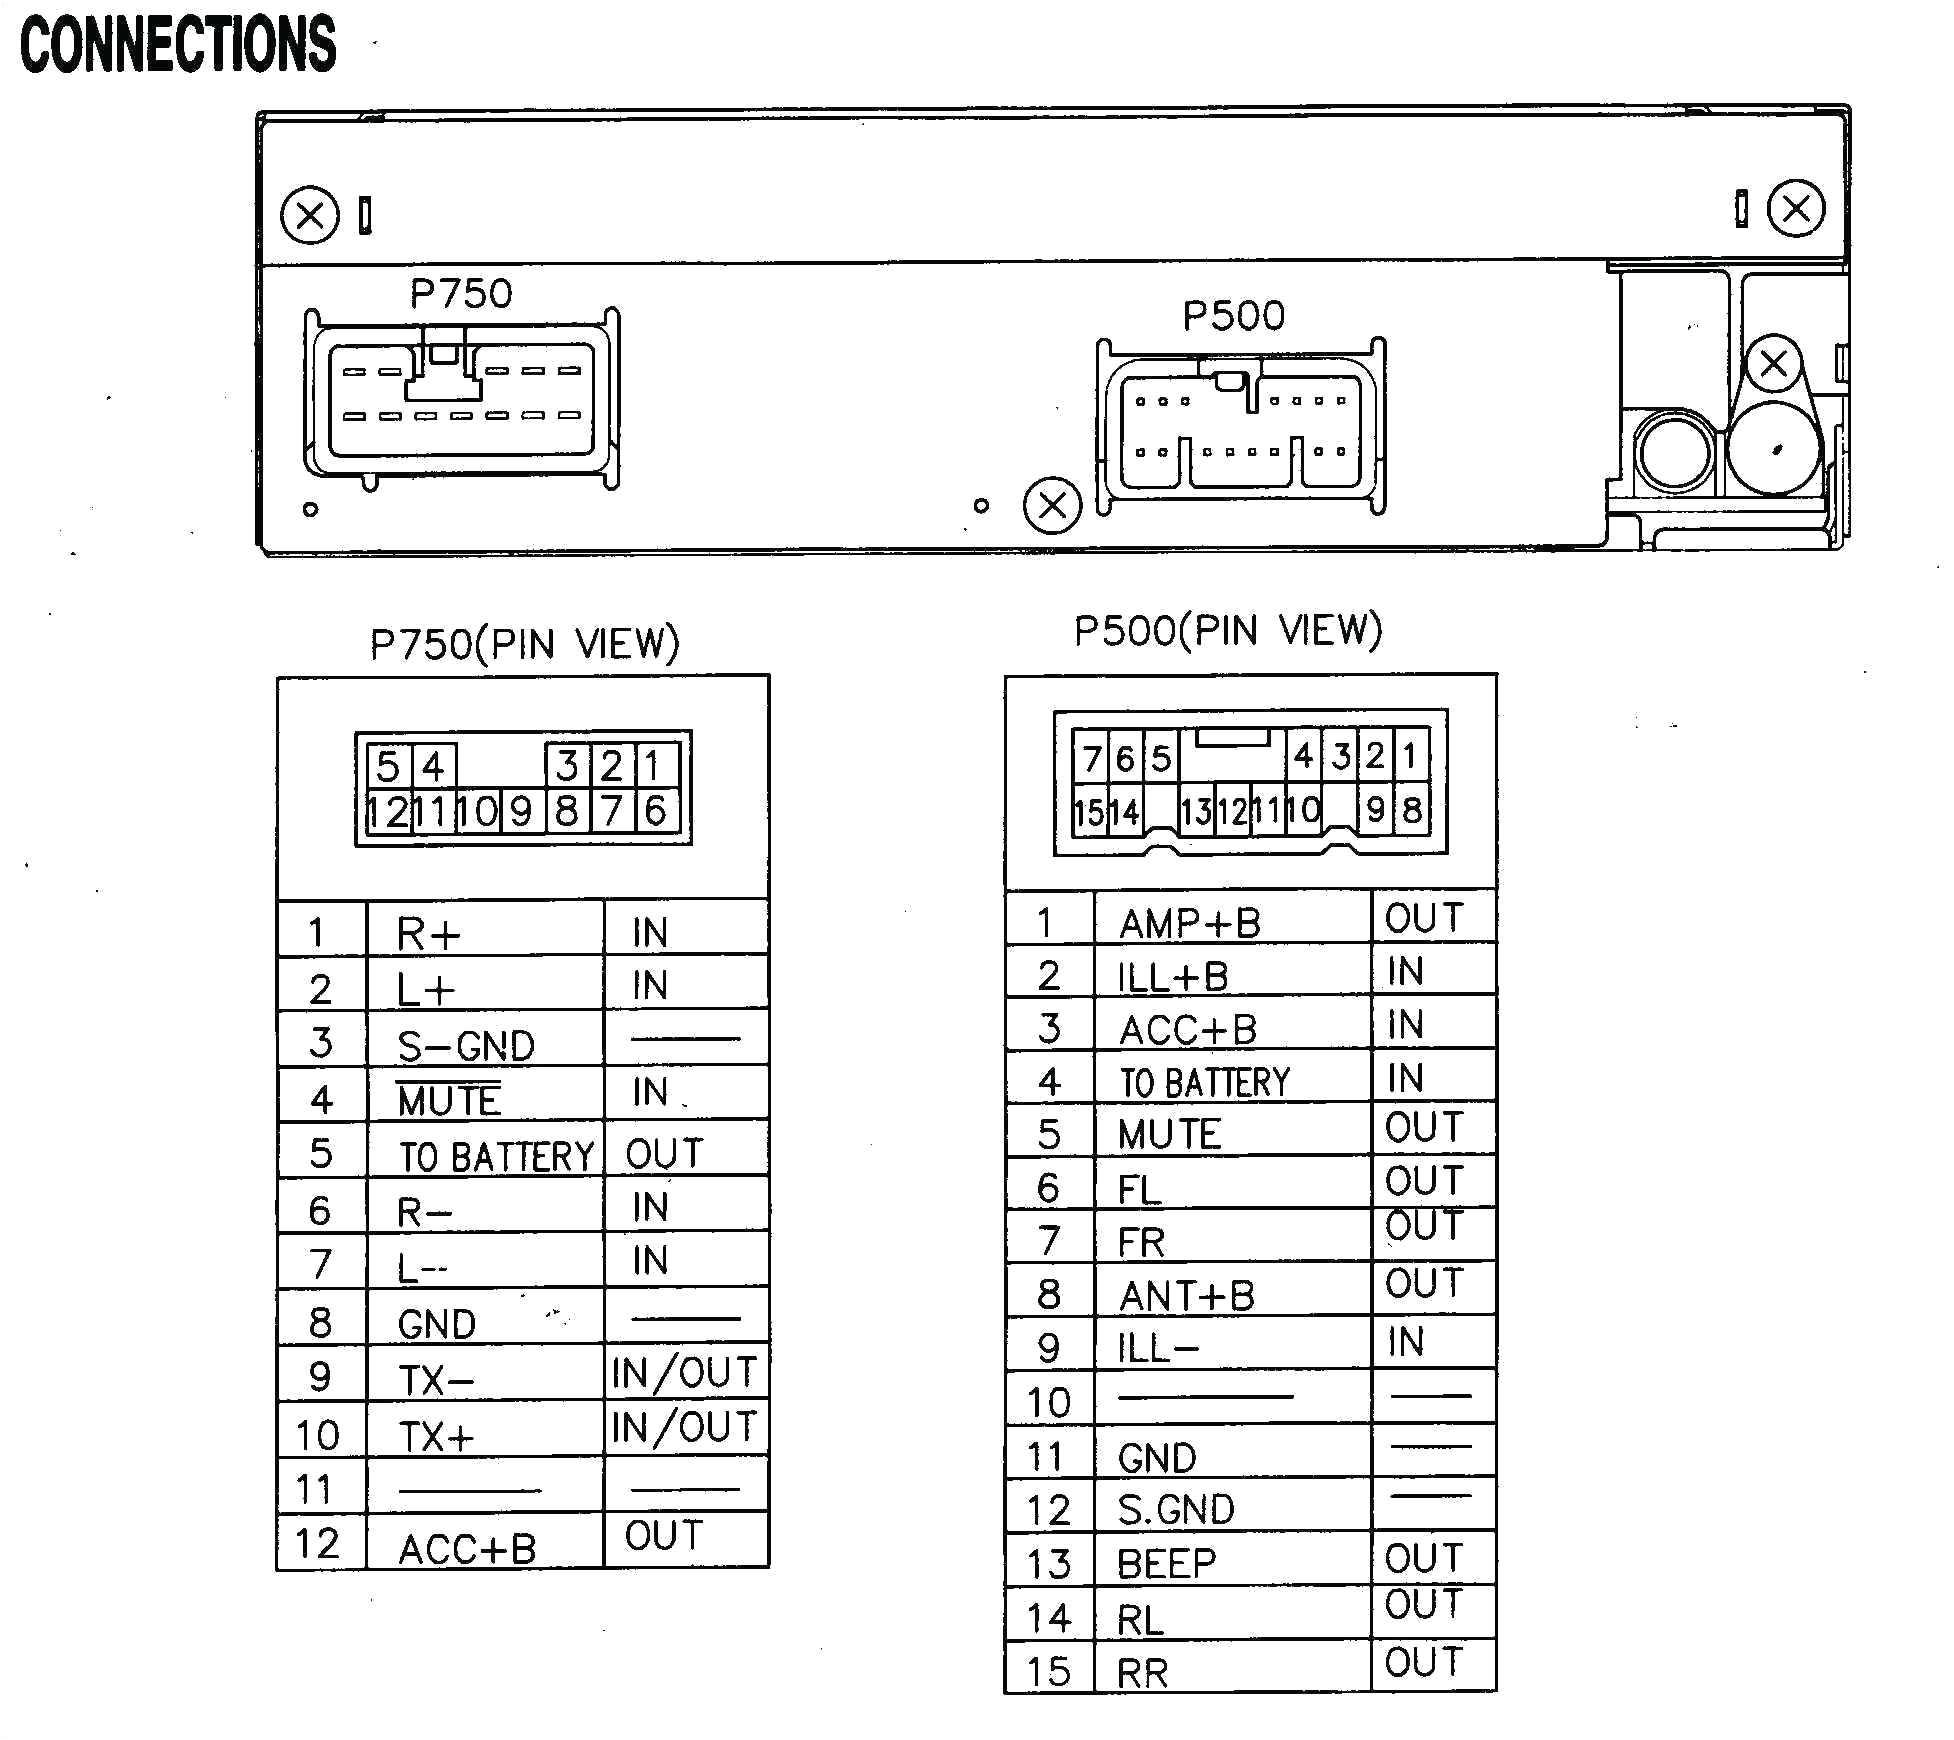 fujitsu ten limited radio wiring diagram elegant contemporary toyota echo wiring diagram vignette electrical of fujitsu ten limited radio wiring diagram jpg